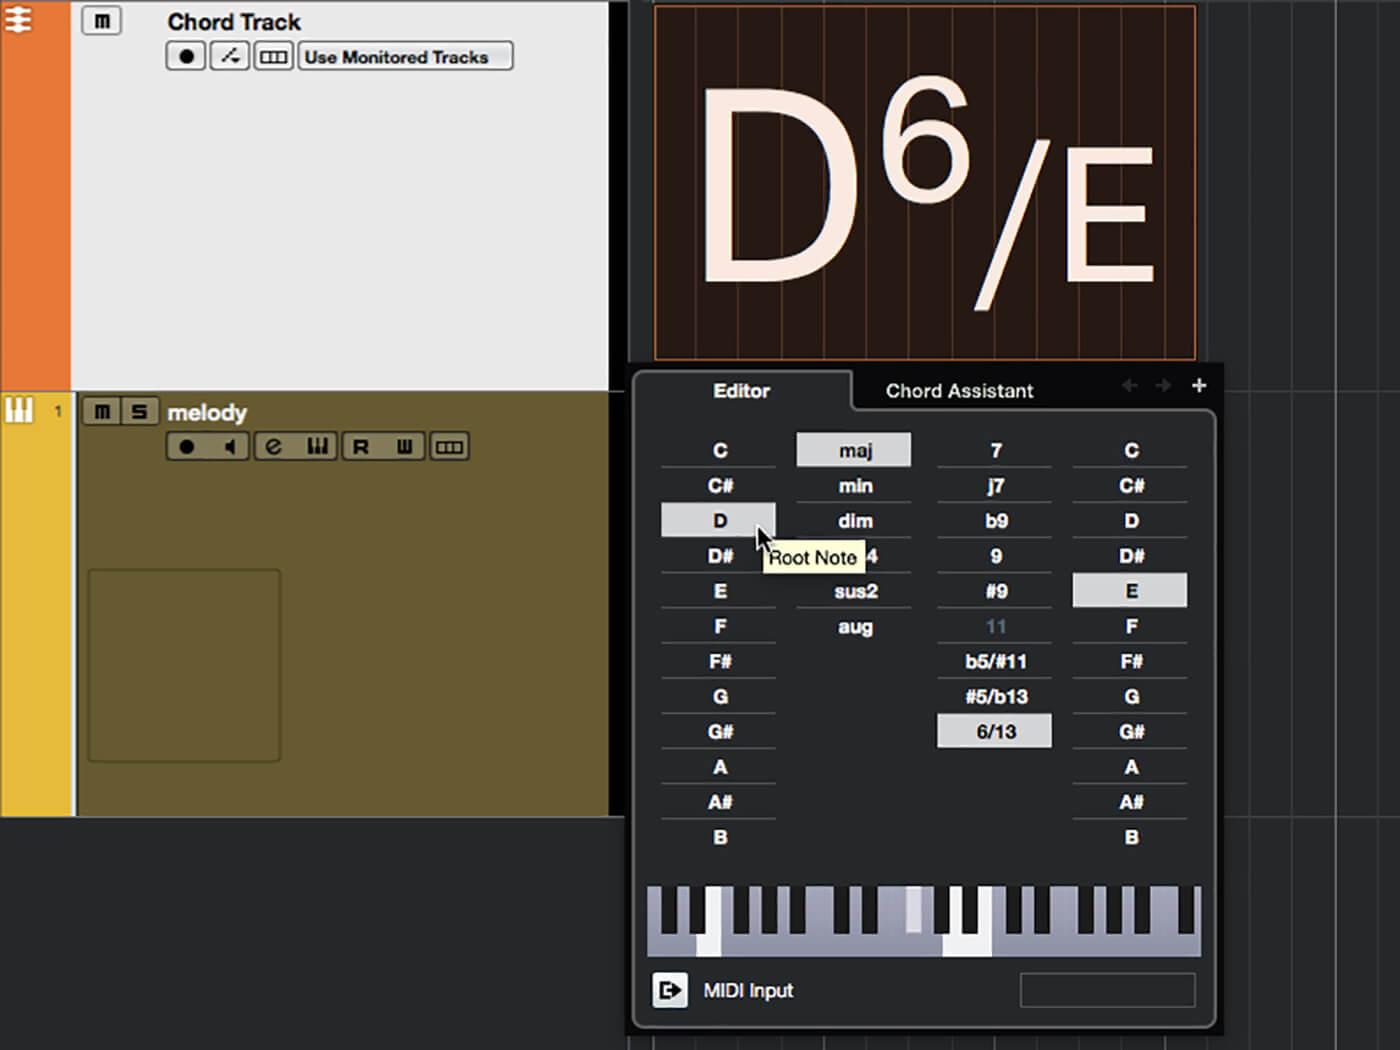 MT 205 Cubase Score Editor Step 3